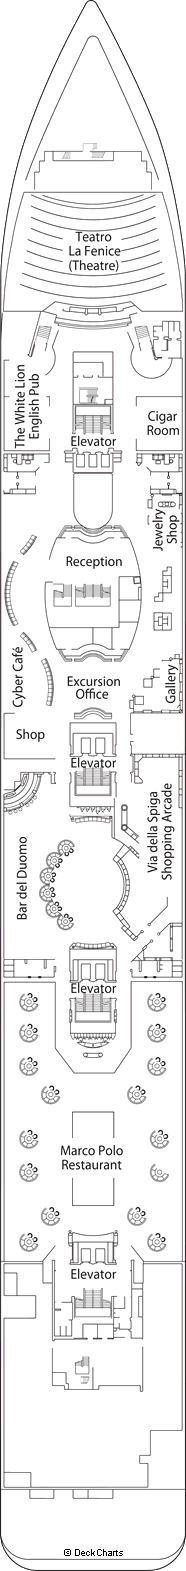 MSC Armonia: Rubino Deck